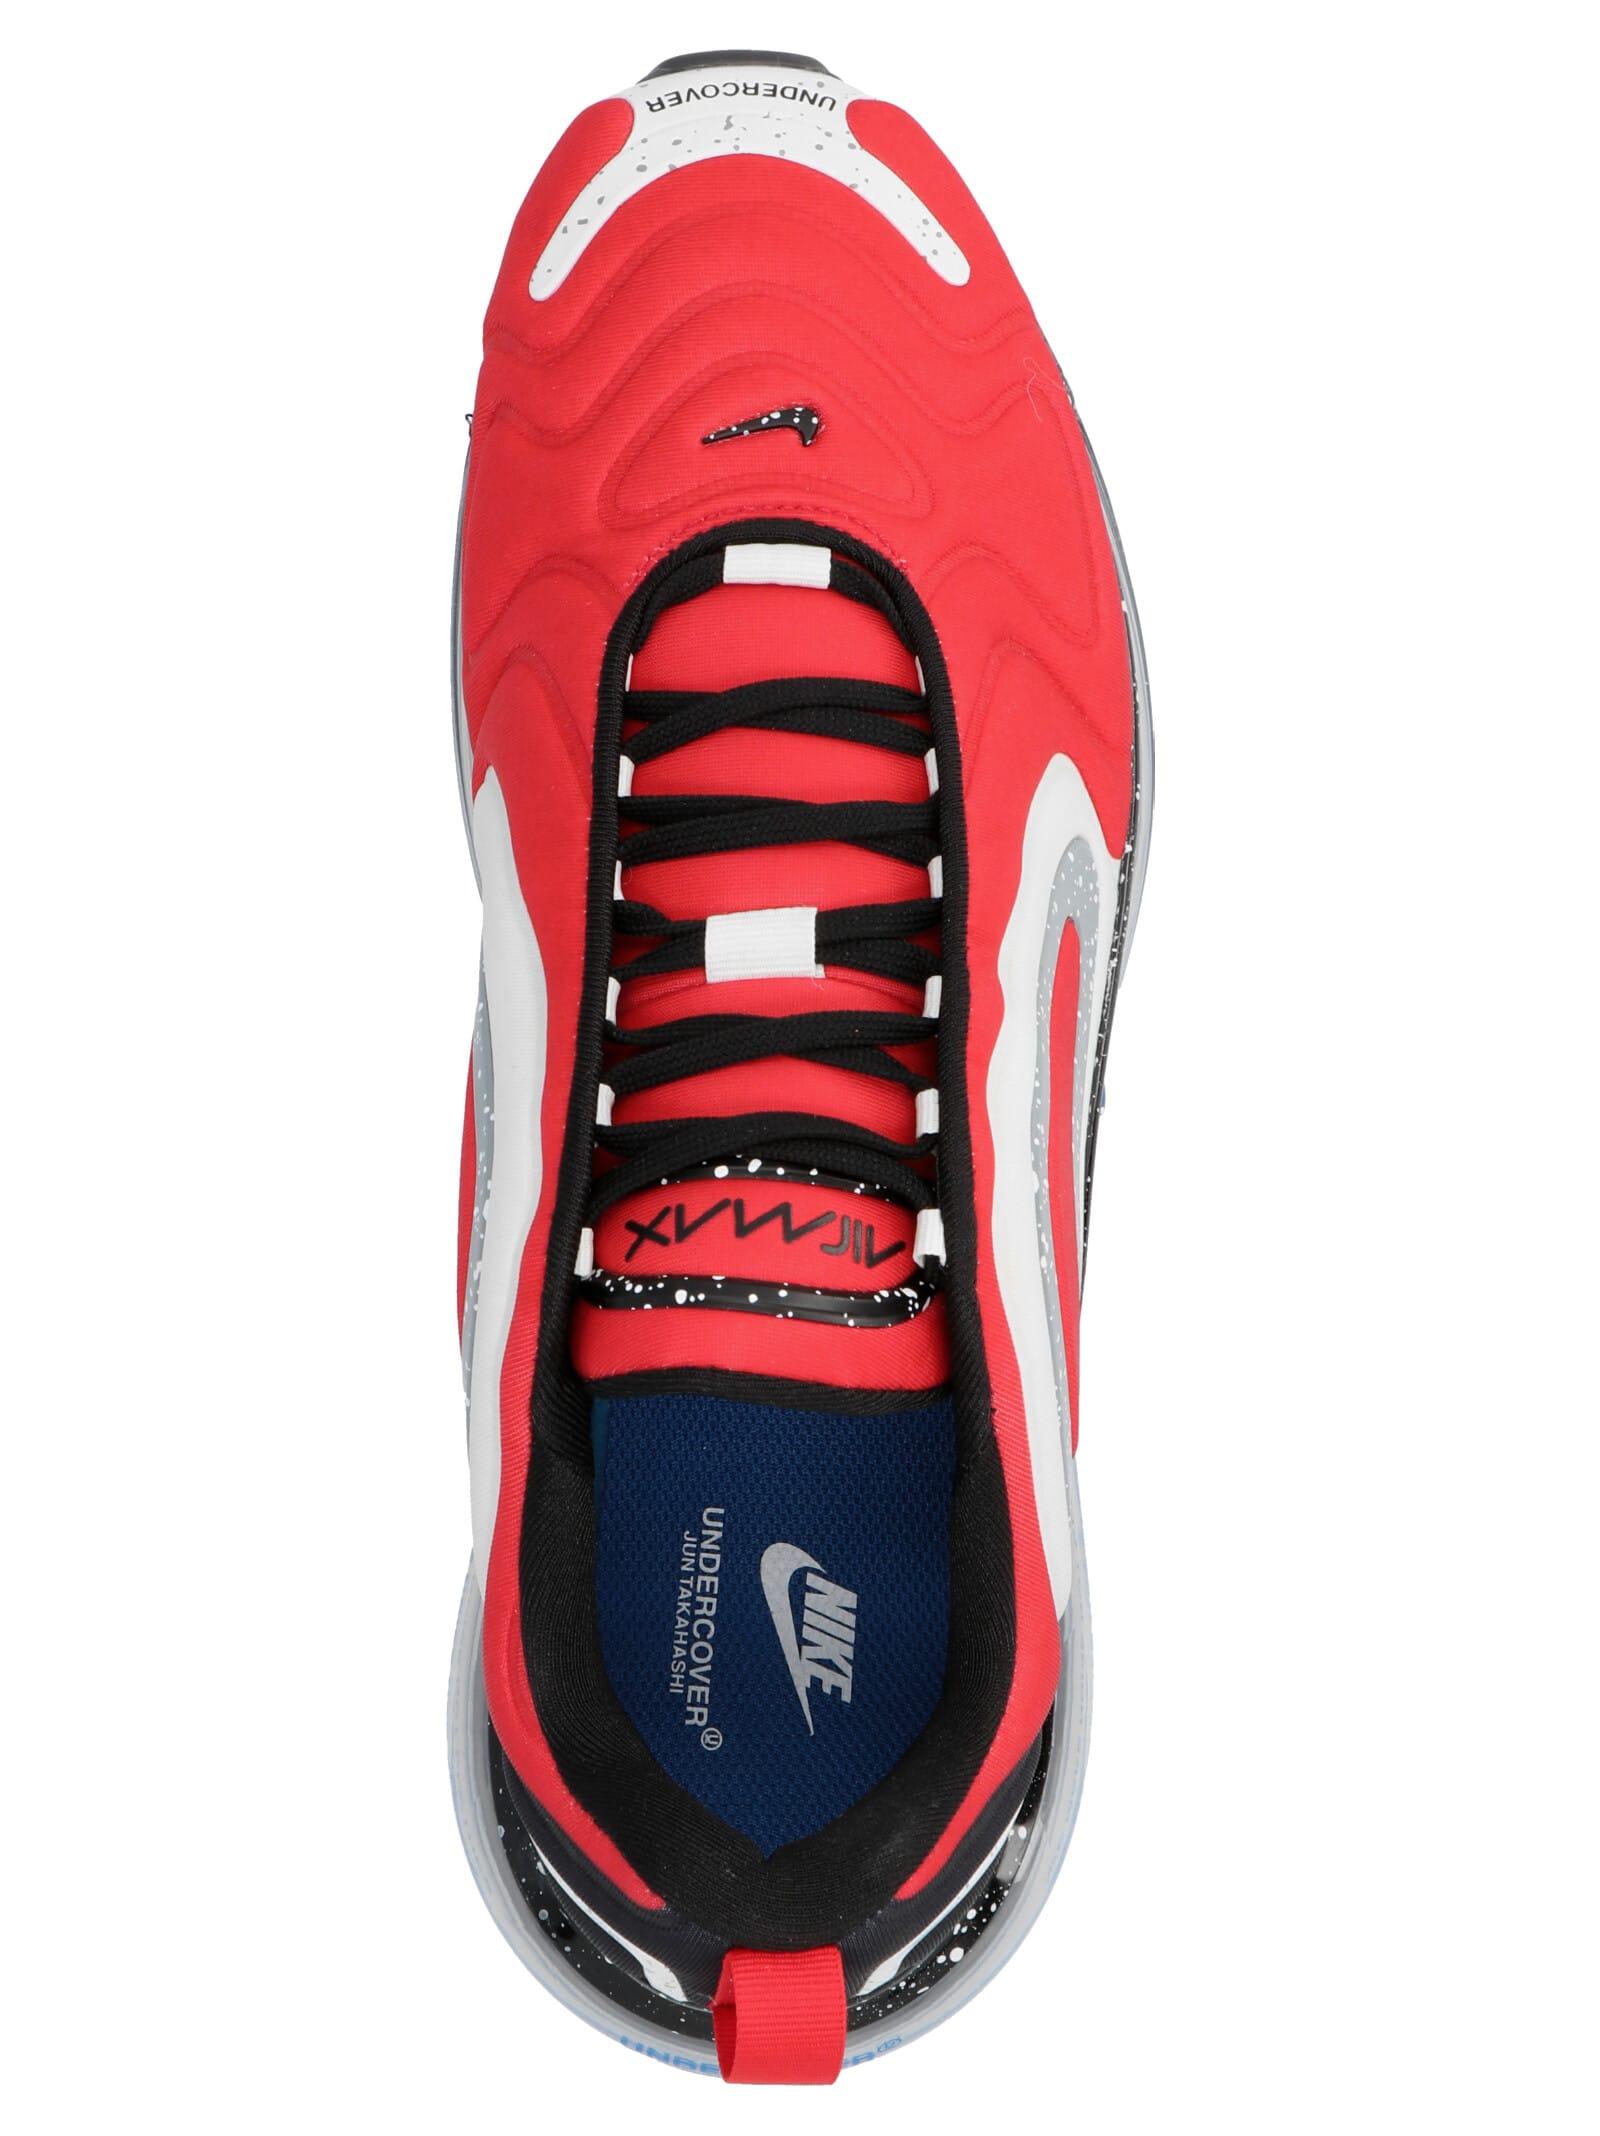 Nike Sneakers Italist Always Like A Sale